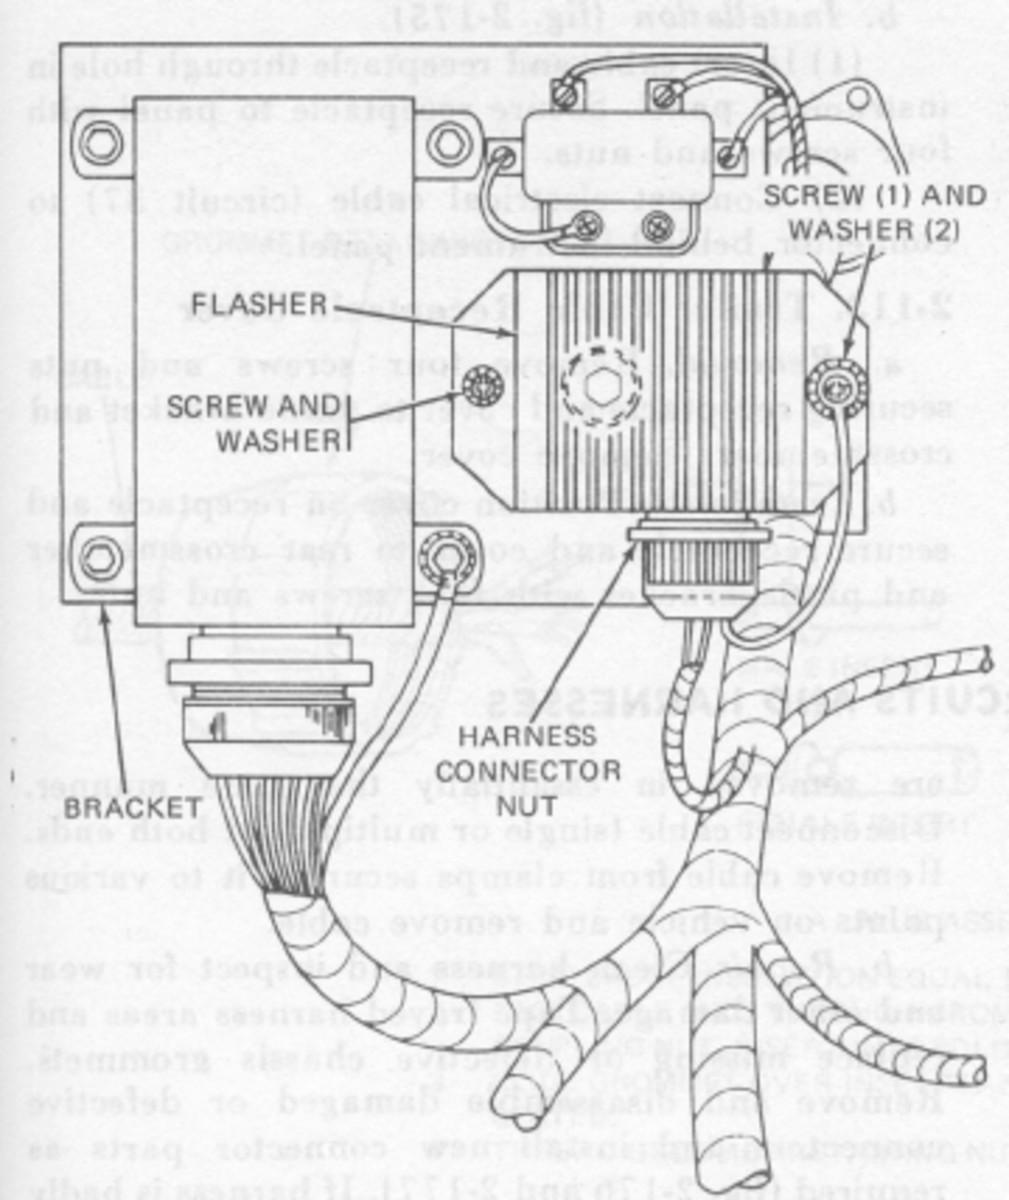 grounding, fig 4, flasher unit.jpg